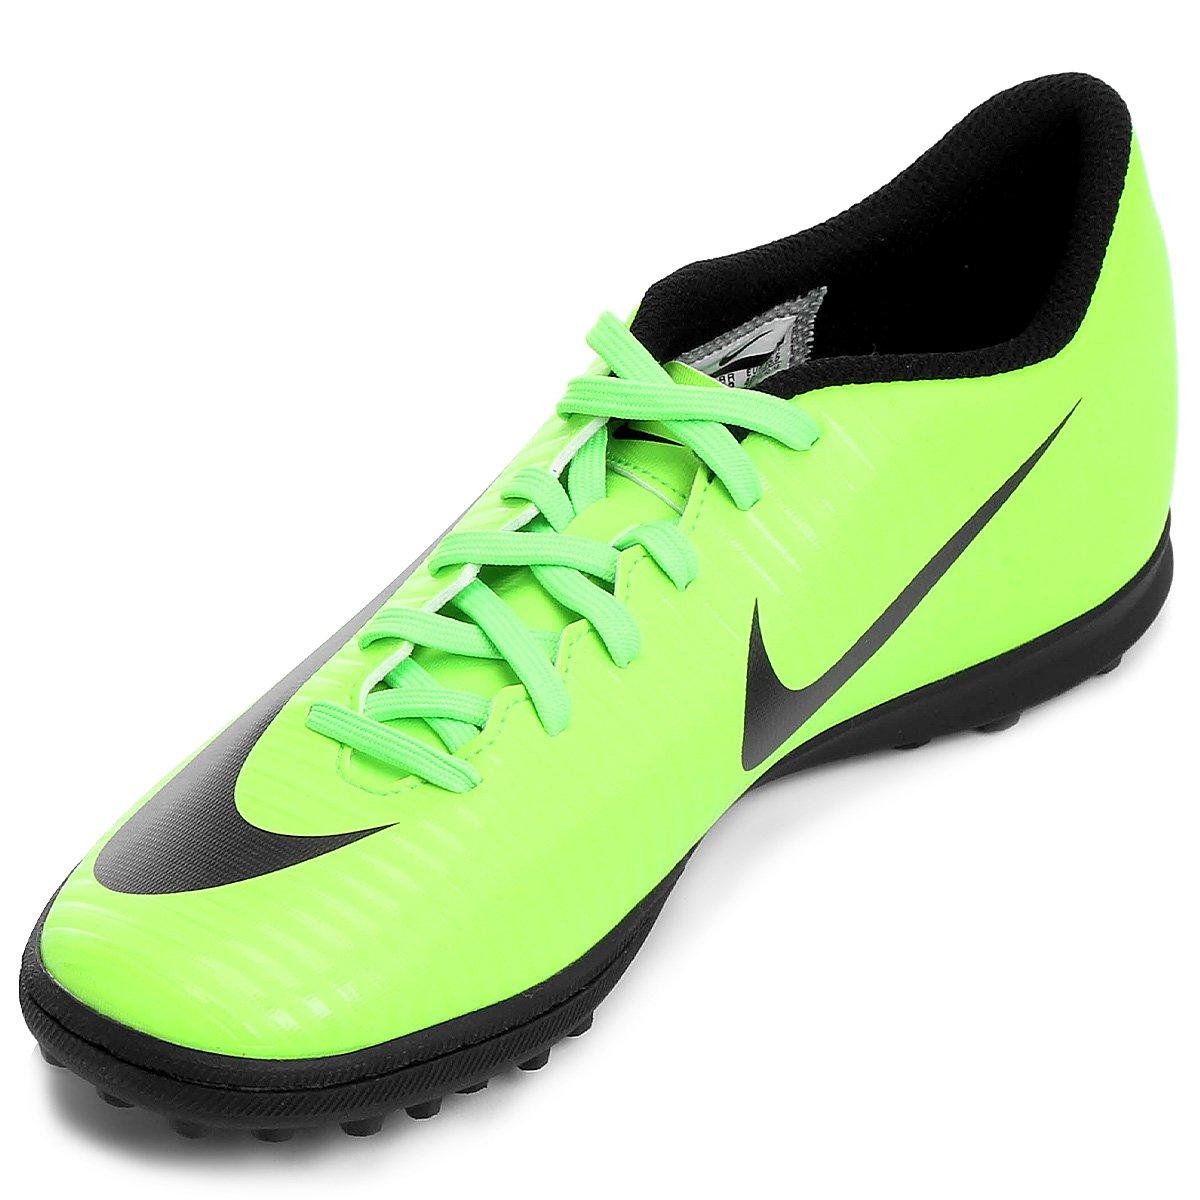 2bb403f575 Chuteira Society Nike Mercurial Vortex 3 TF - Verde e Preto - Compre ...